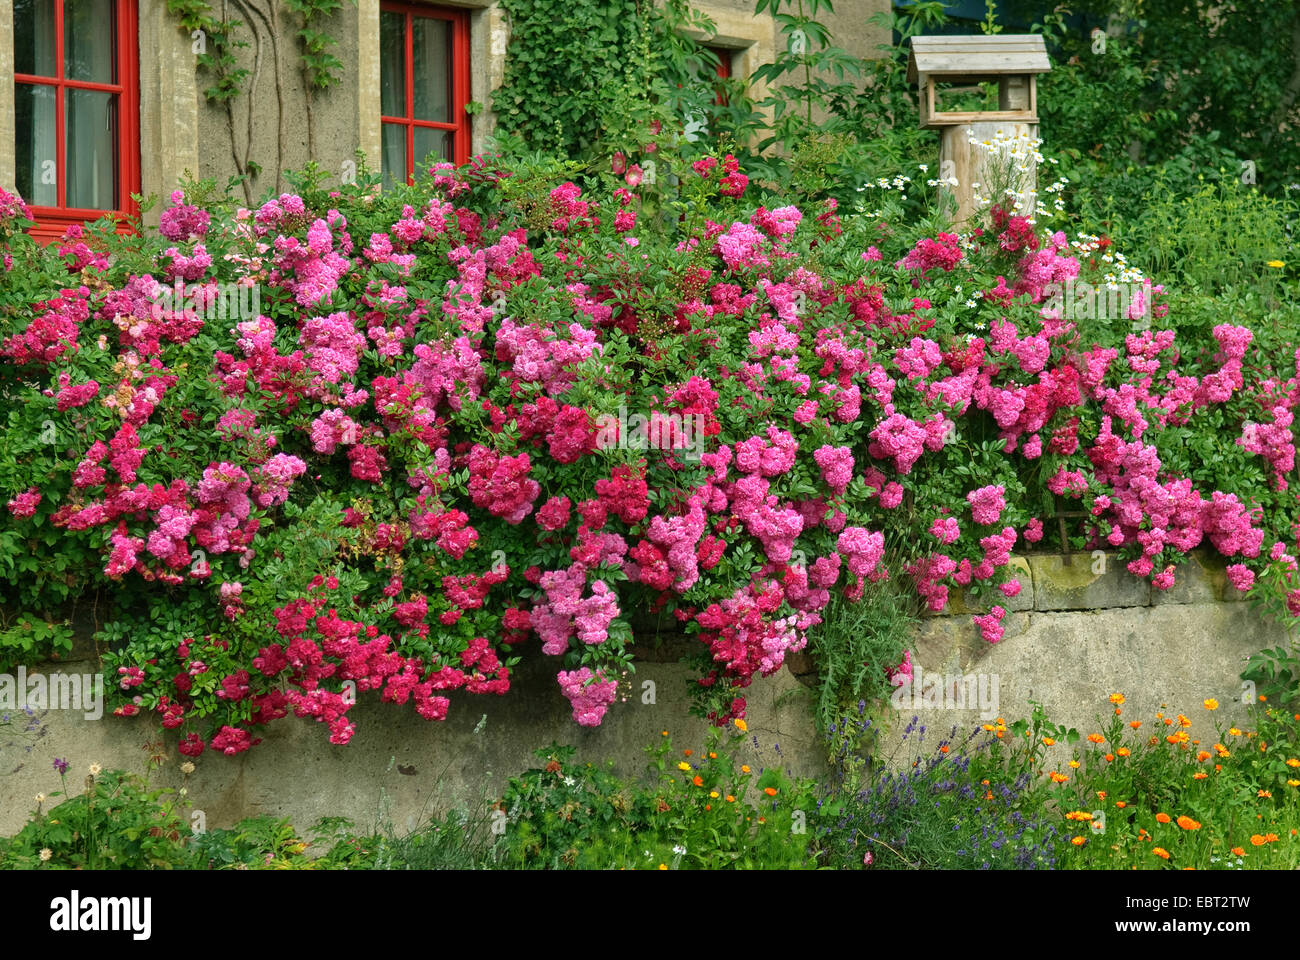 Ornamental rose rosa 39 super excelsa 39 rosa super excelsa cultivar stock photo royalty free - Rose cultivars garden ...